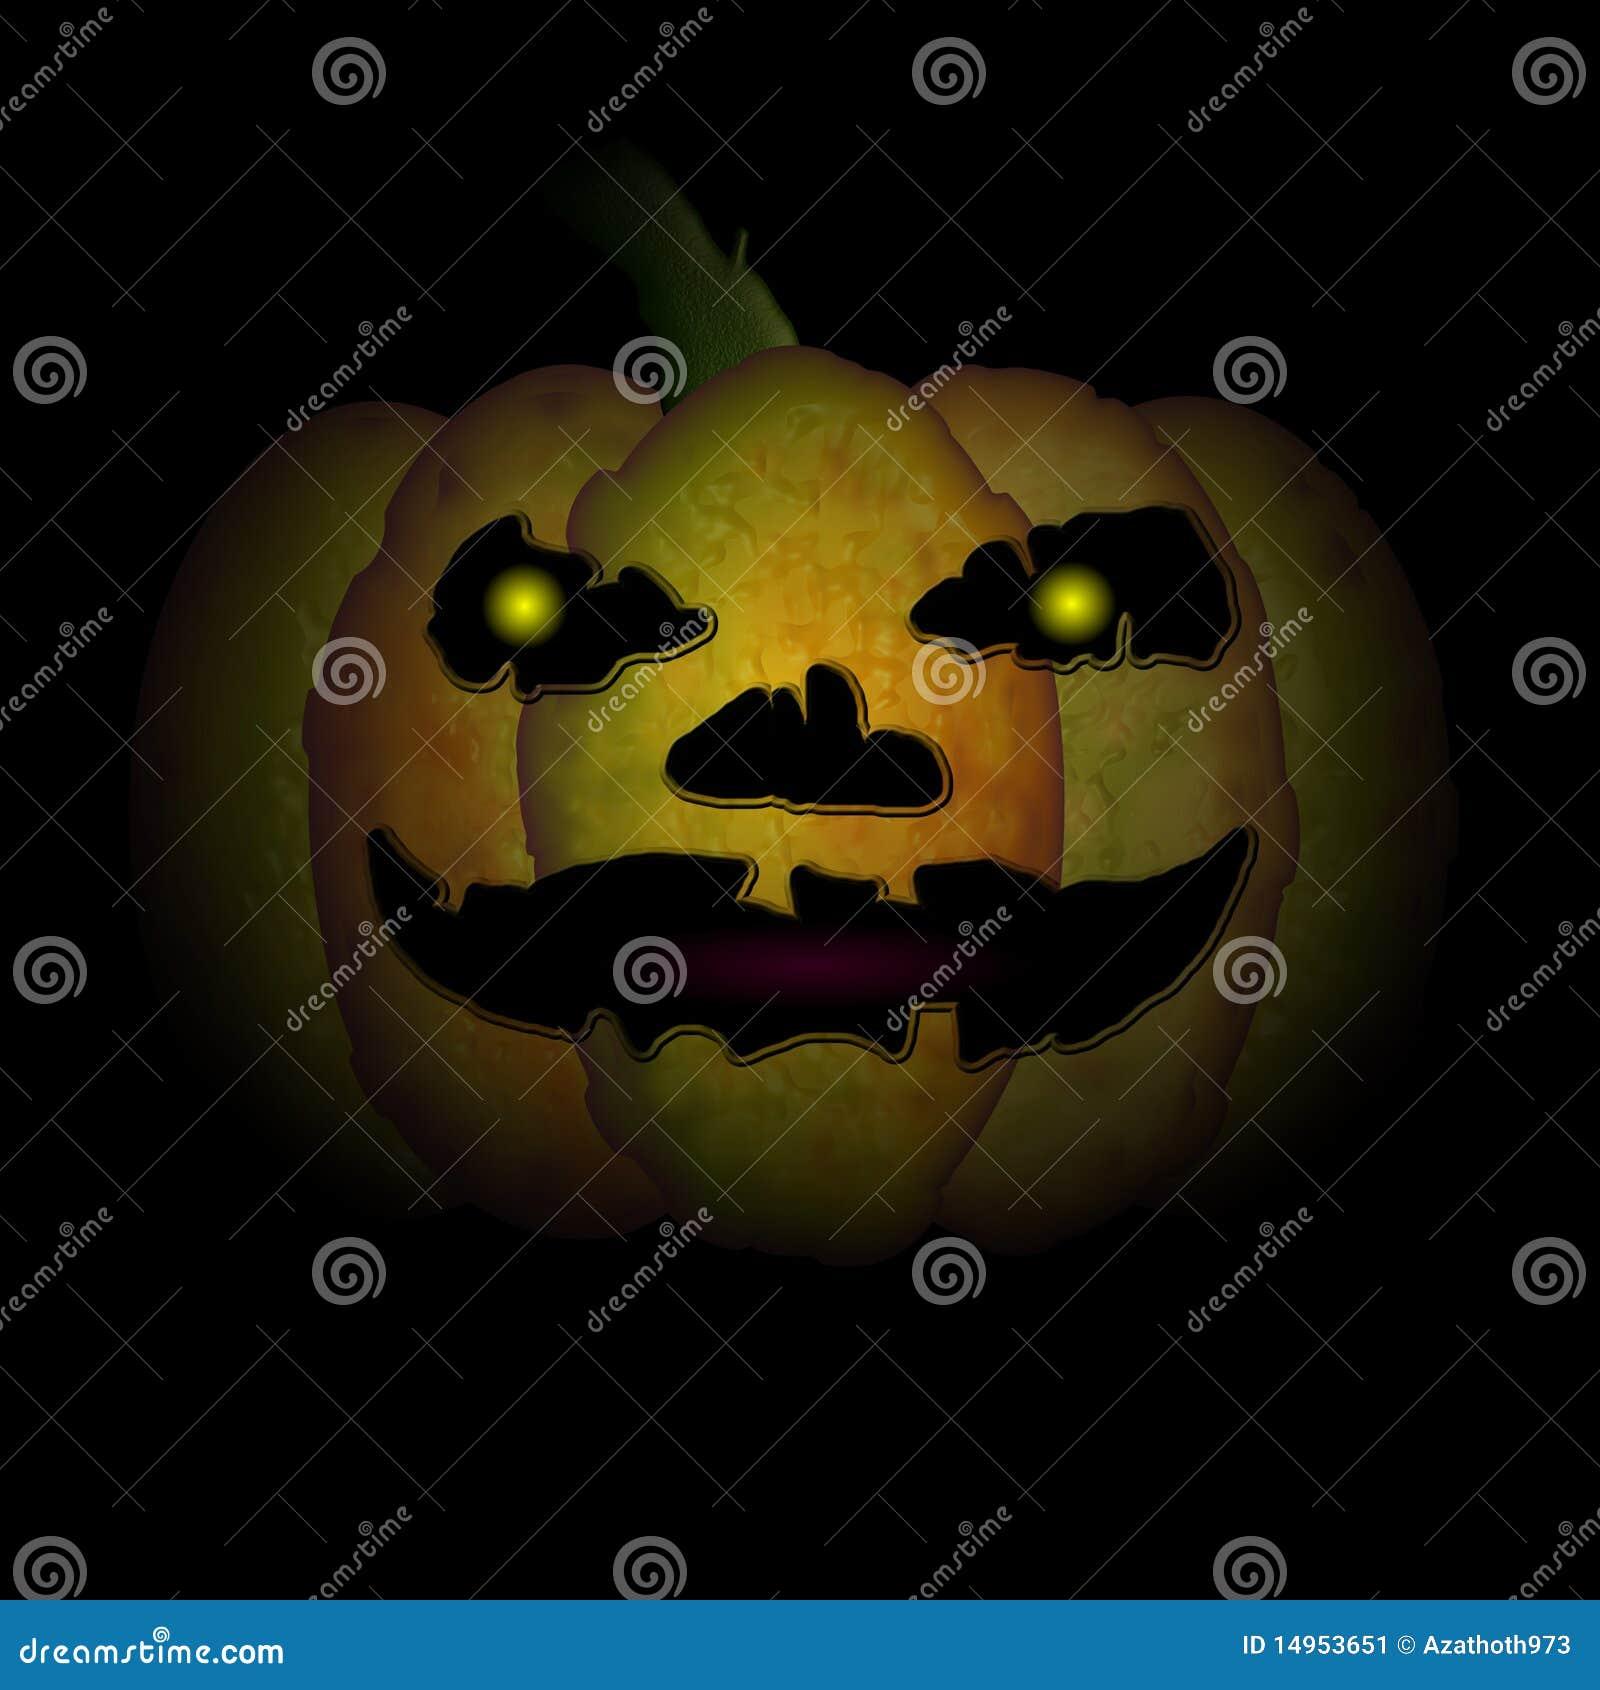 Very Scary Halloween Decorations: Very Scary Halloween Pumpkin Stock Illustration